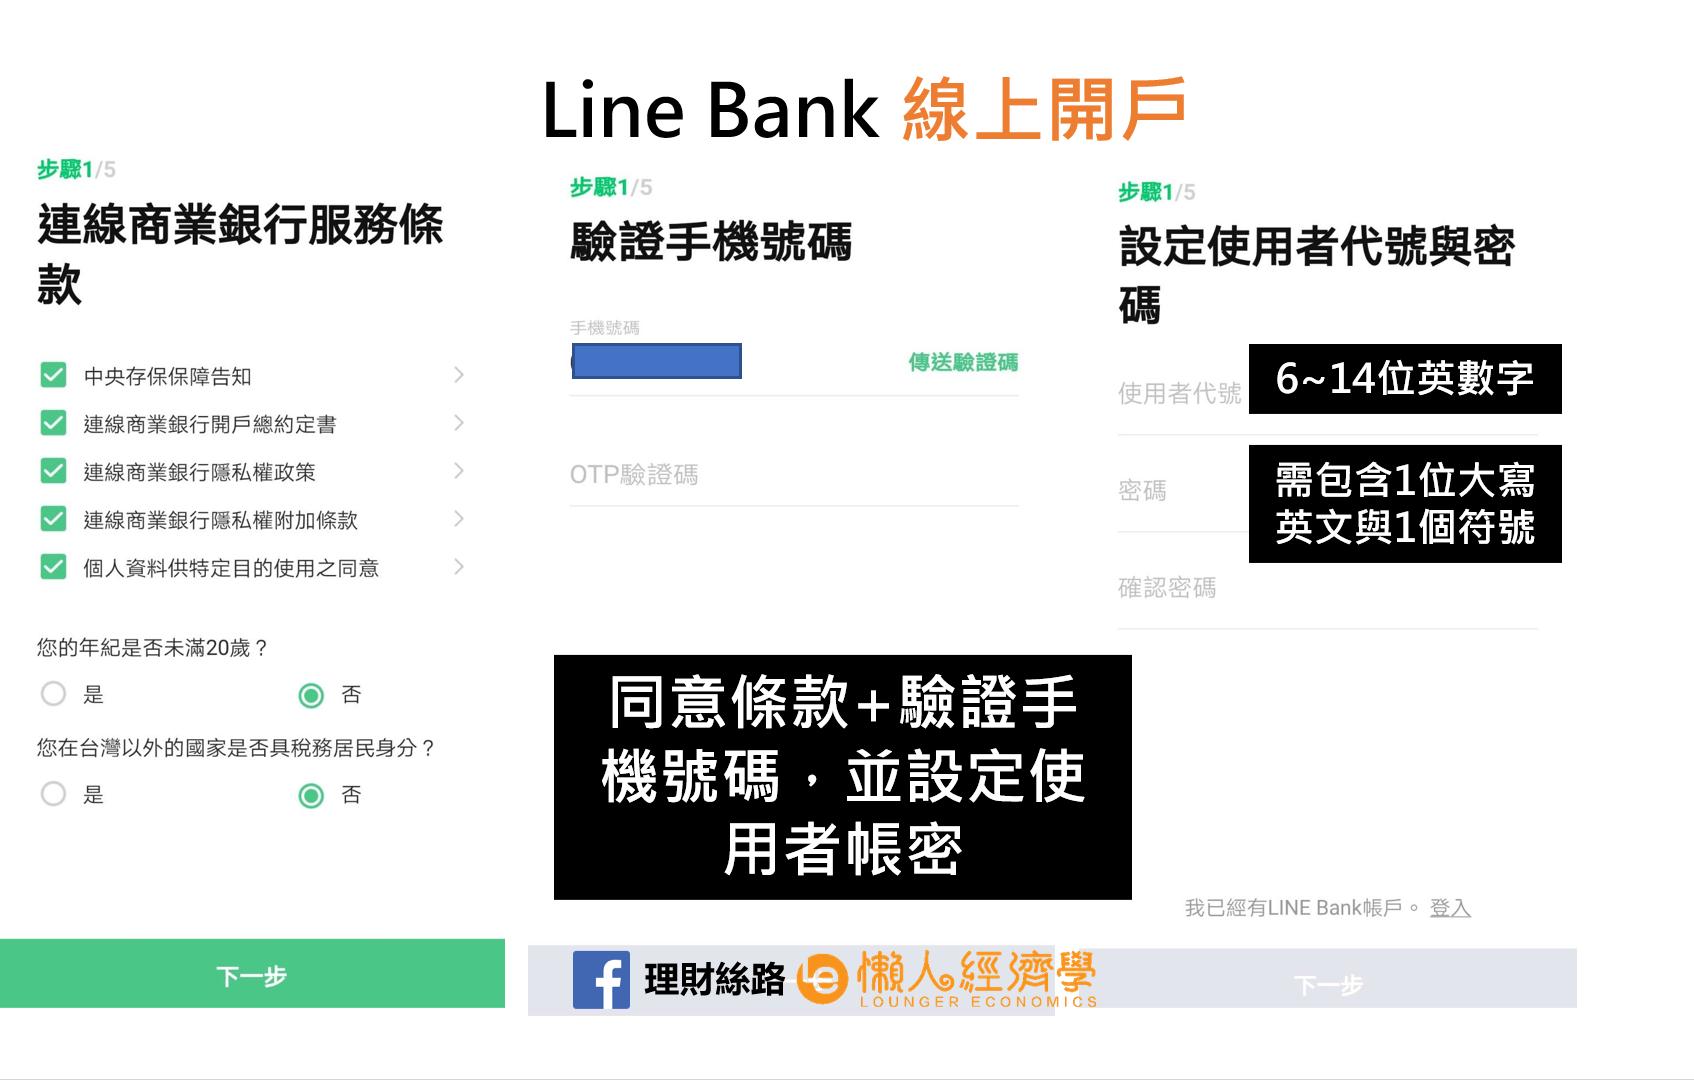 Line Bank同意條款